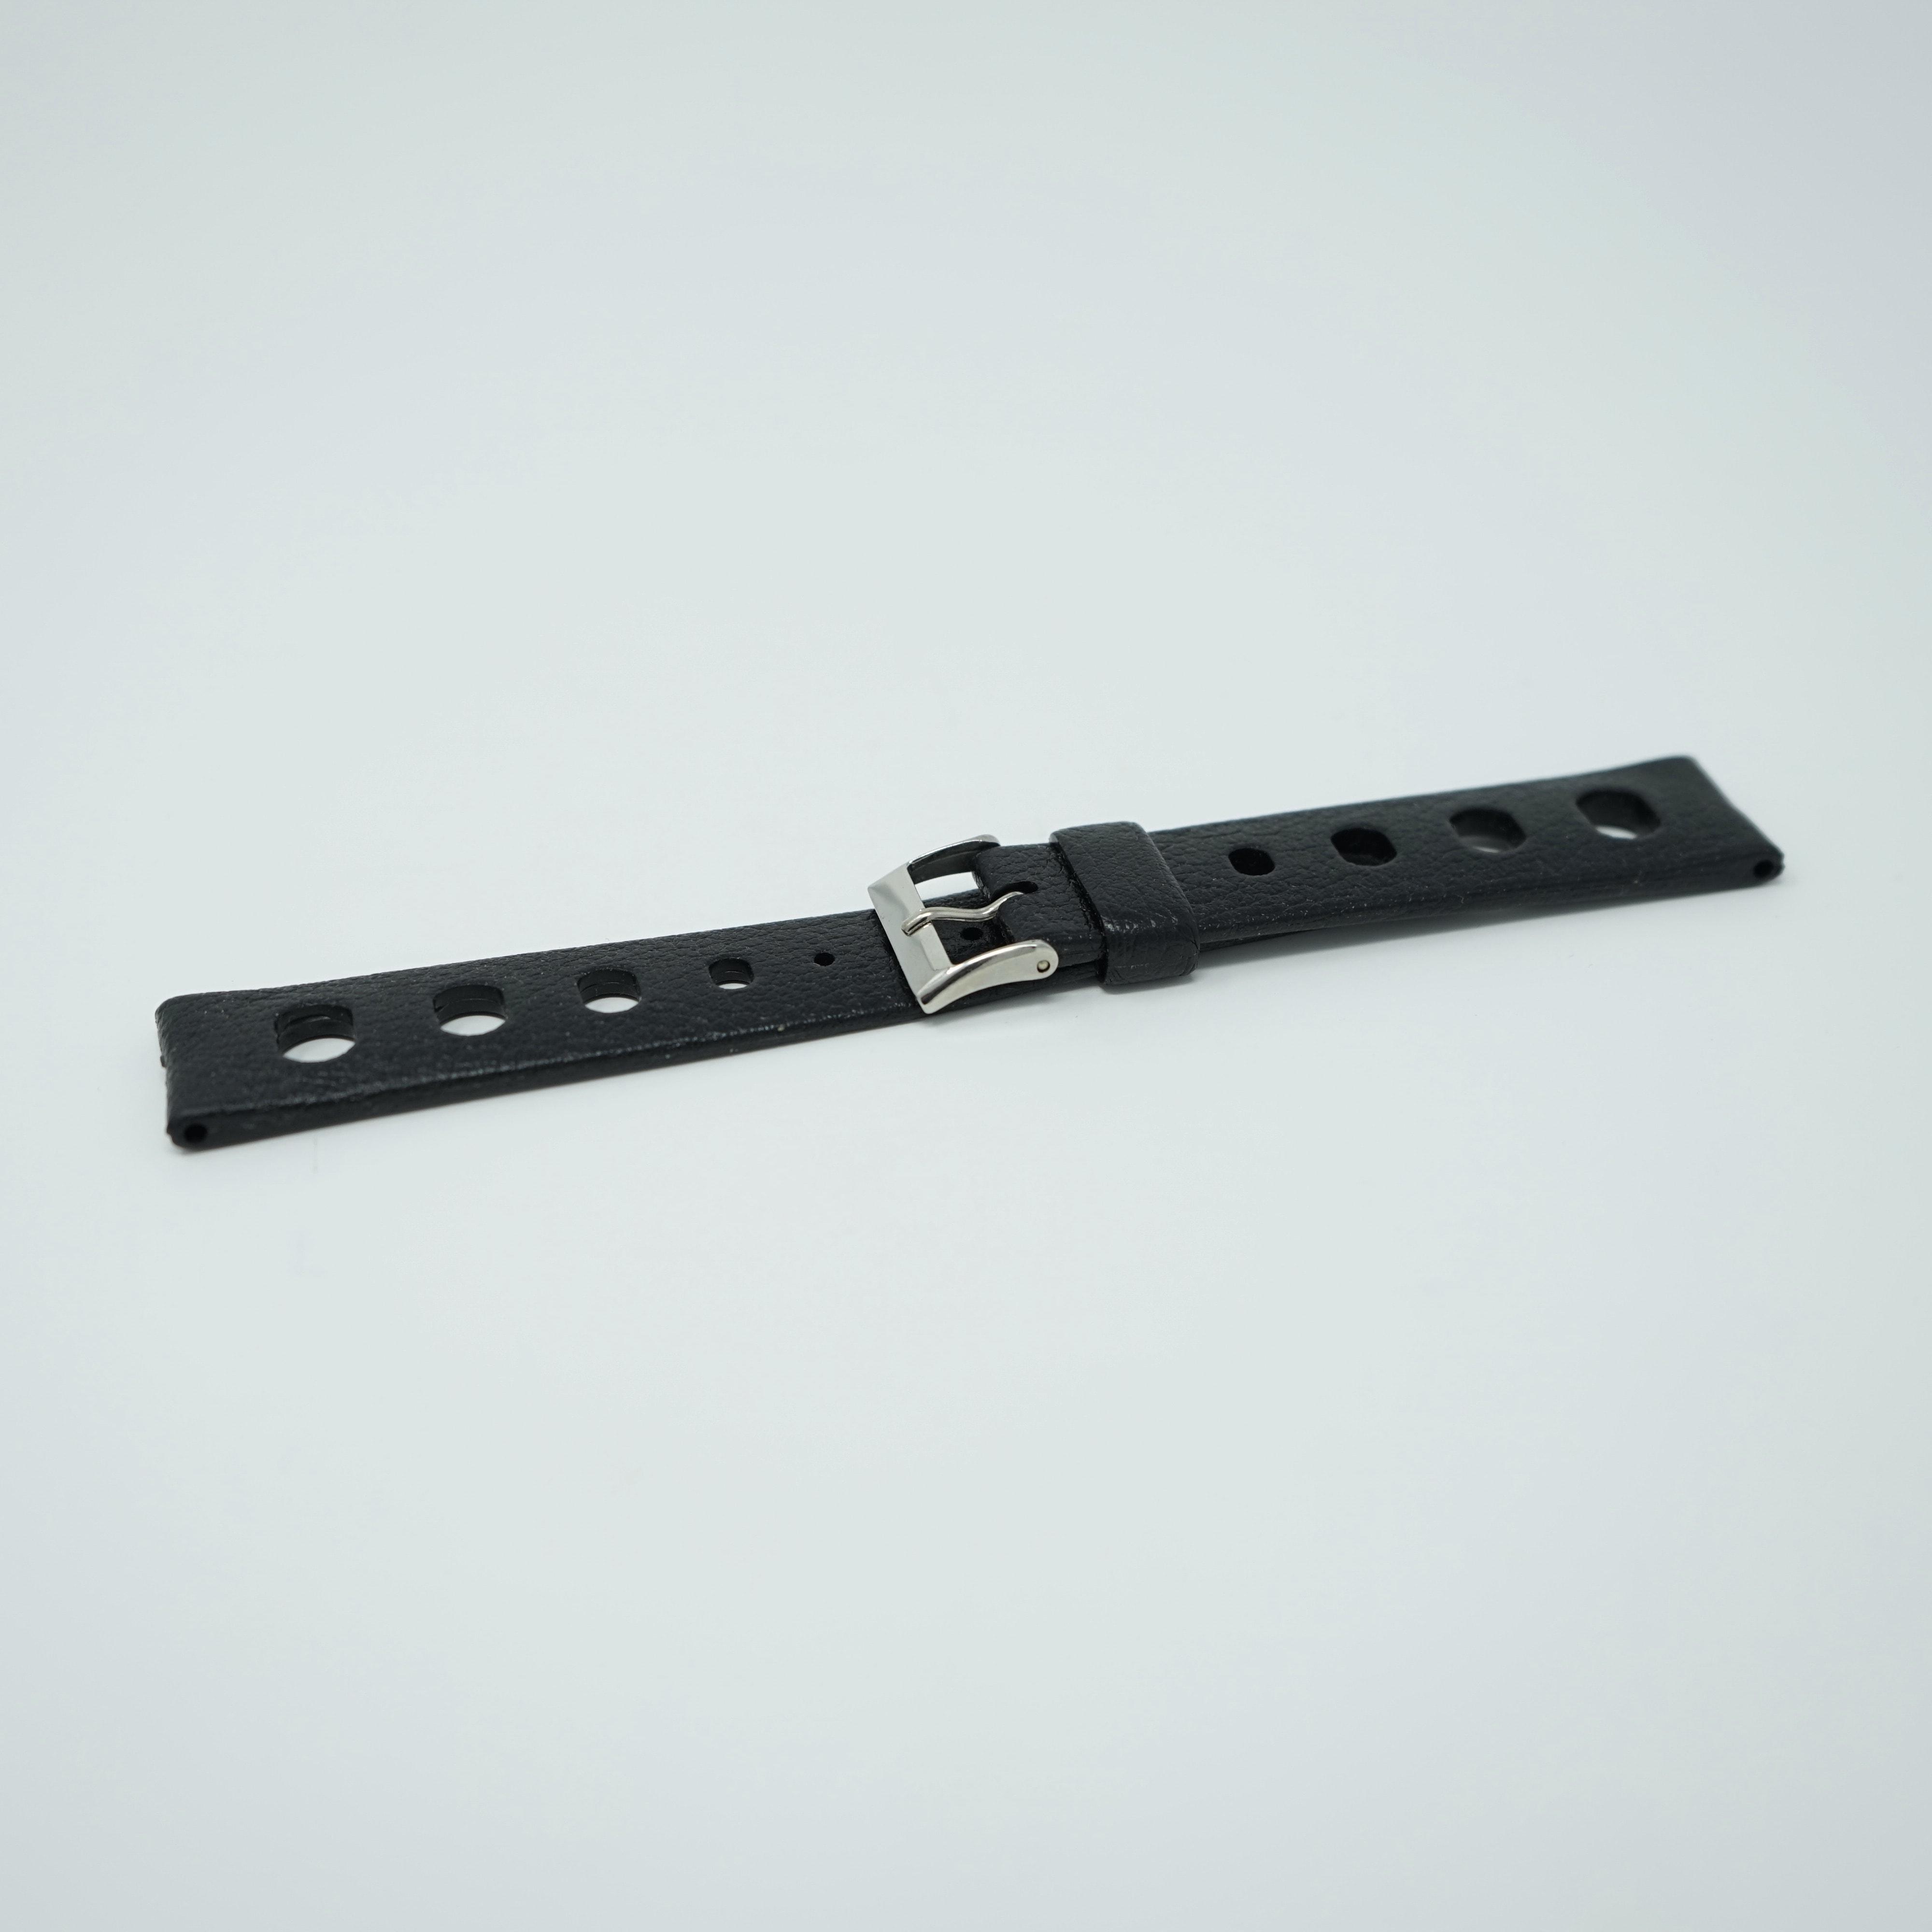 Bracelet Tropic Sport Noir 18mm Spécial Nautic-Ski Avant